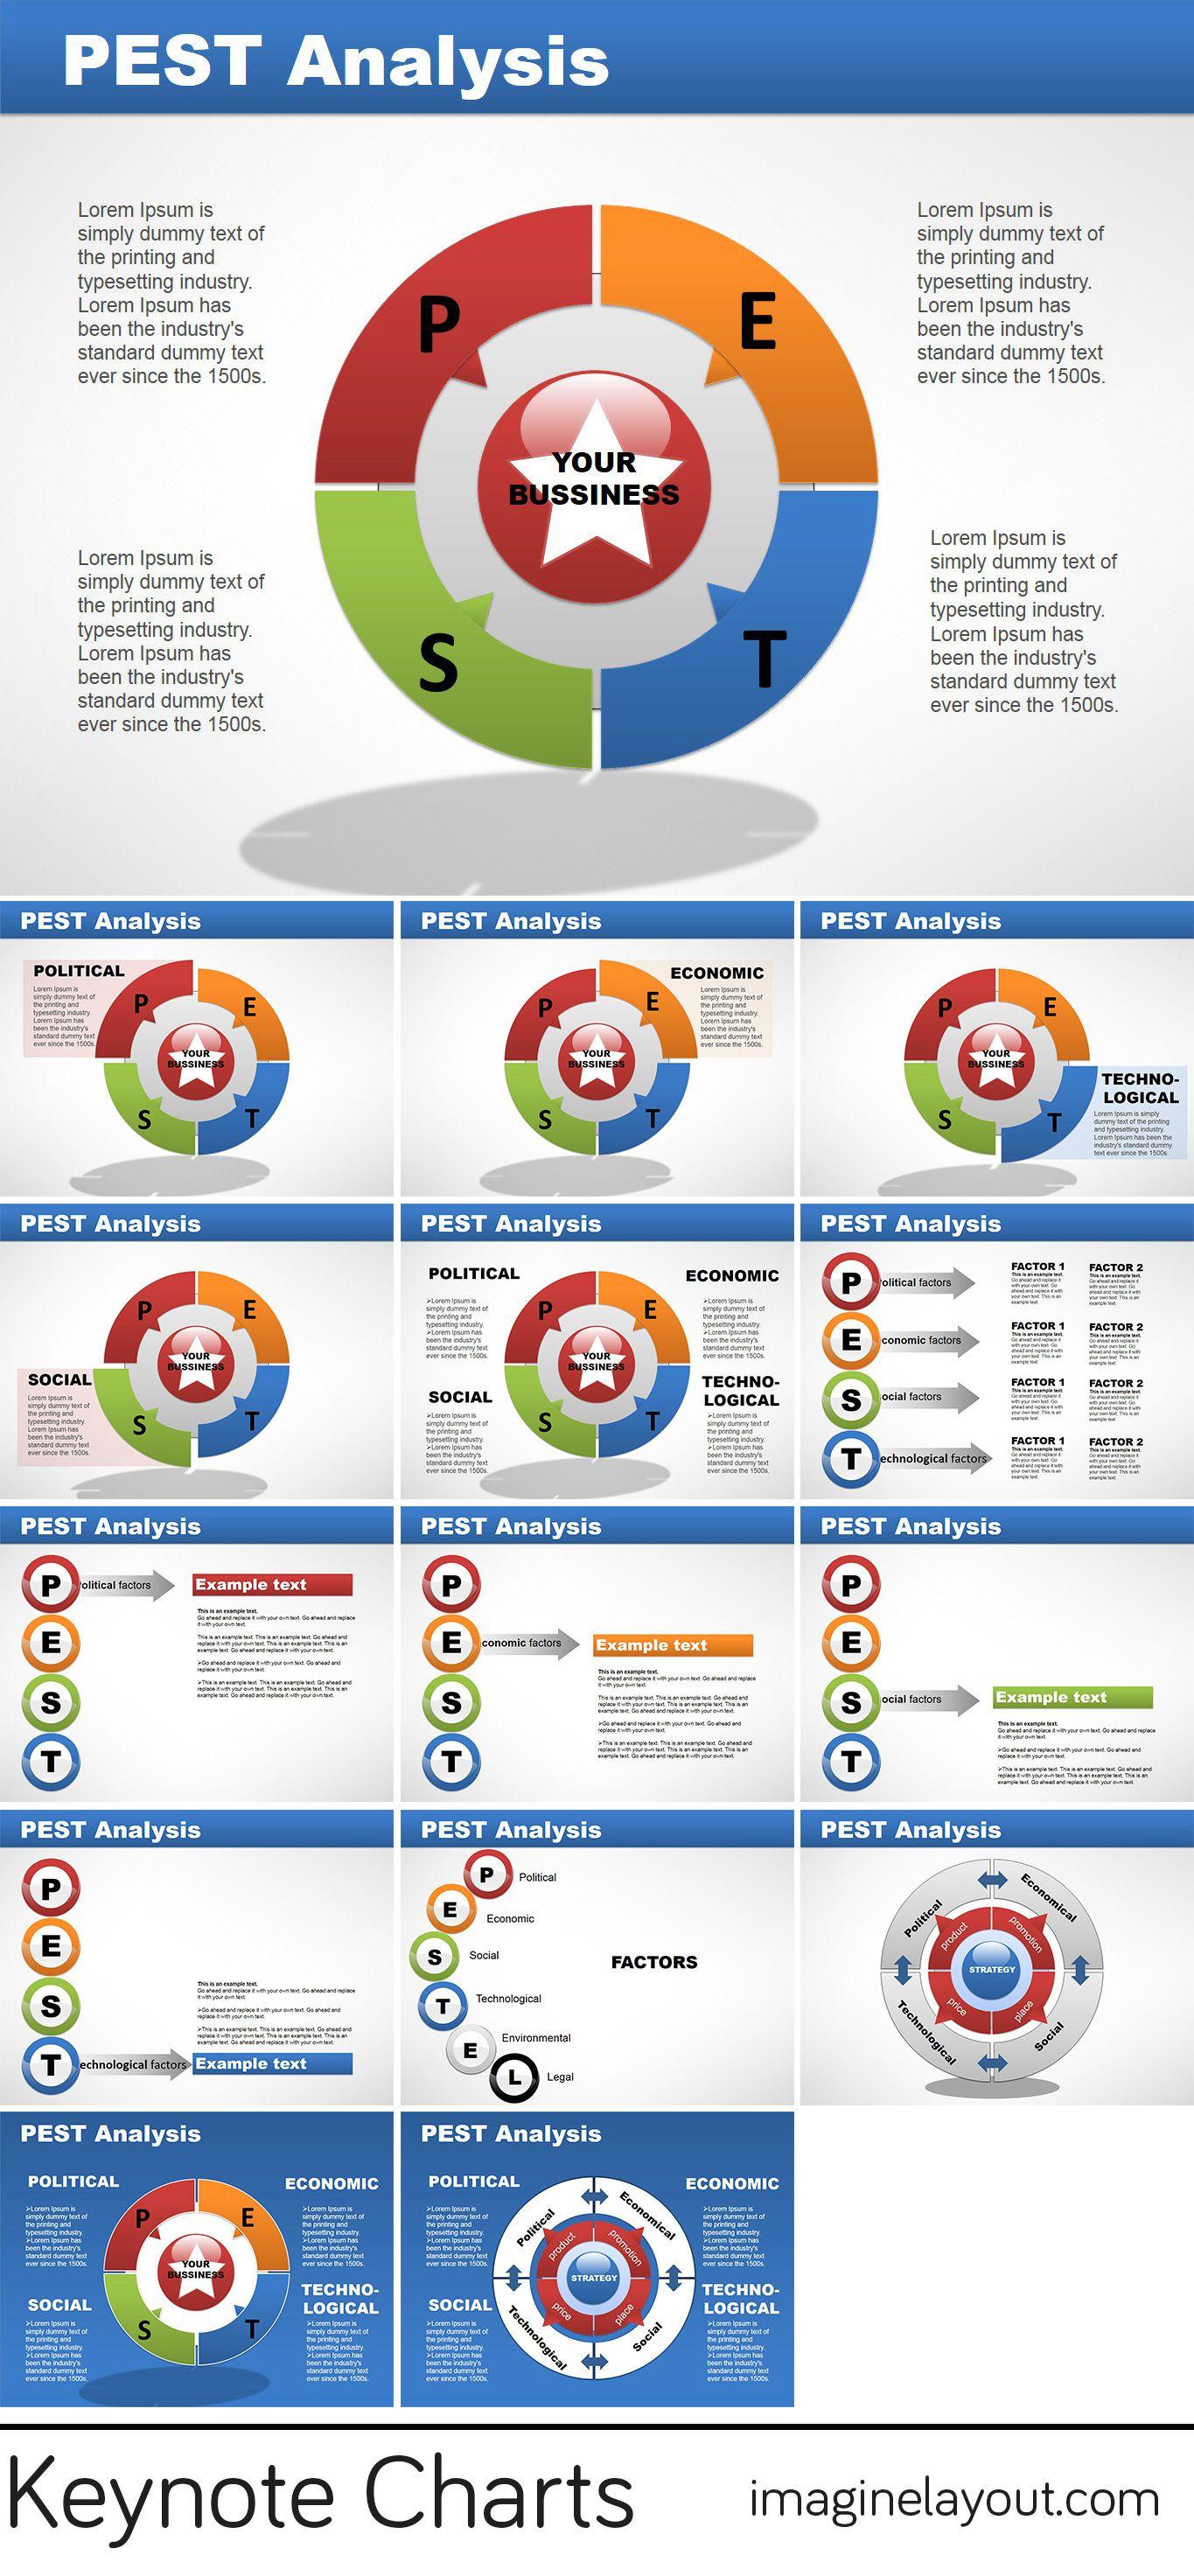 Pest Analysis Keynote Charts  Keynote Chart And Template